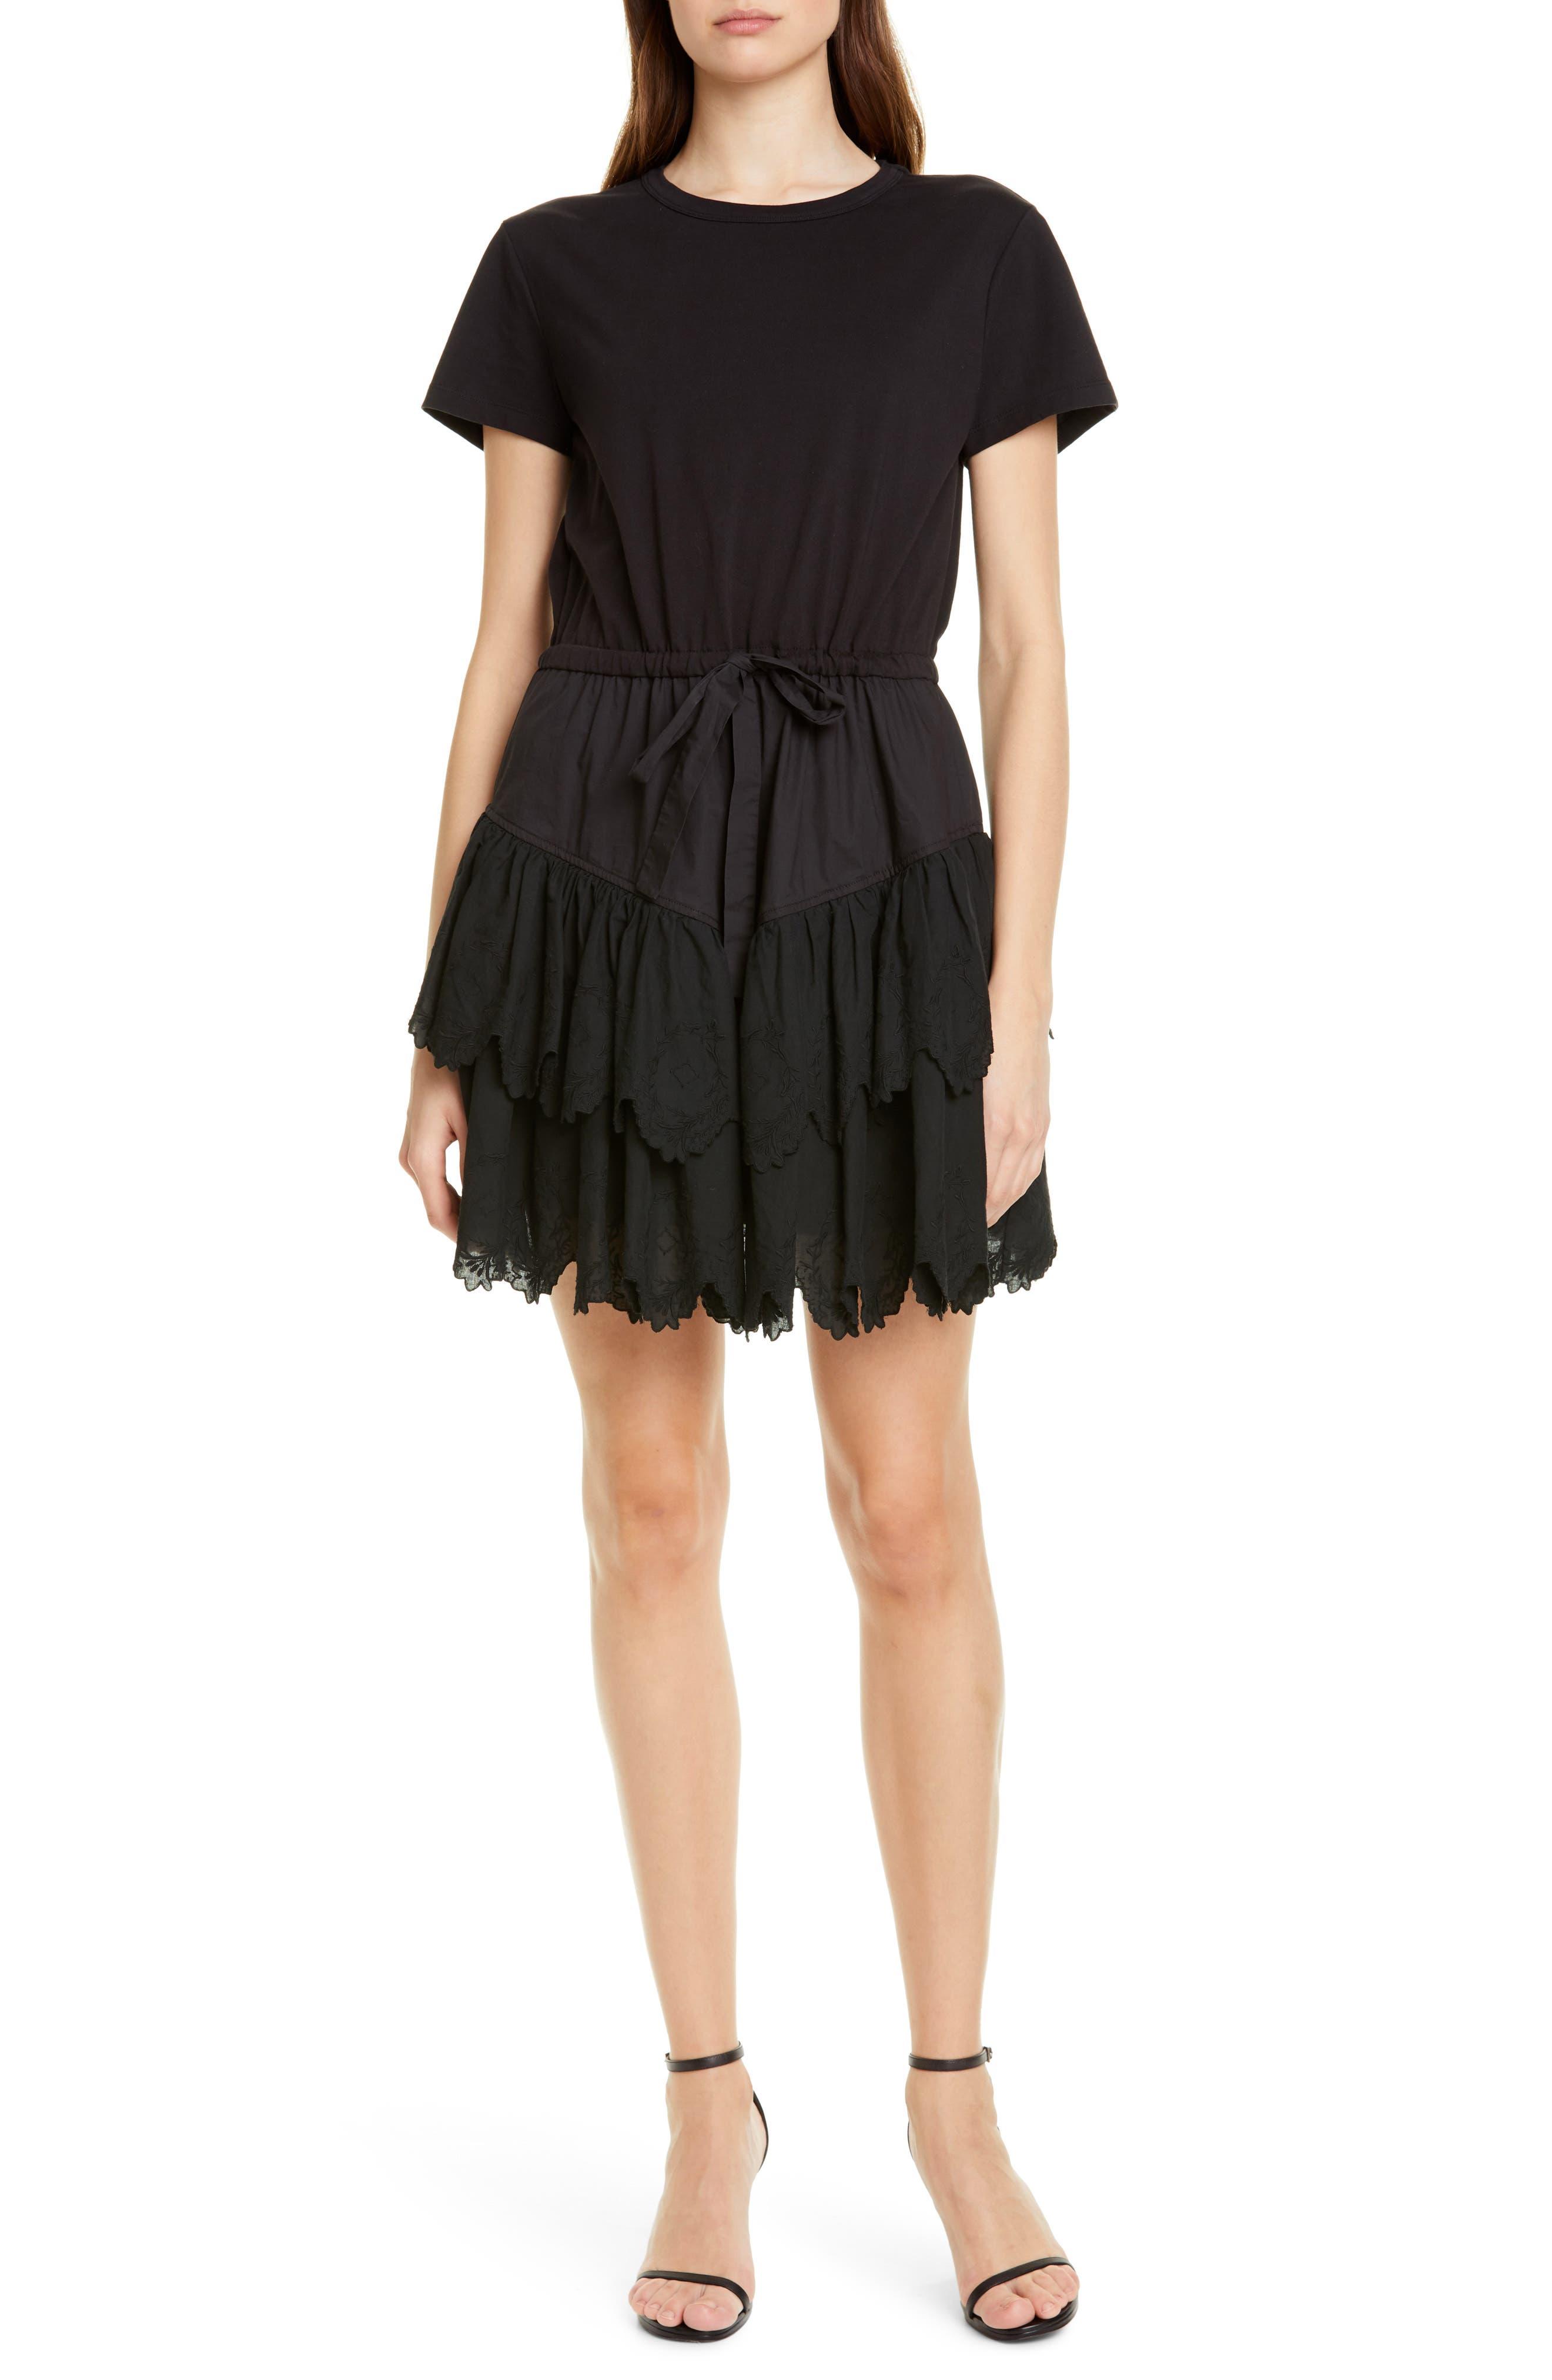 La Vie Rebecca Taylor Lace Detail Tiered Cotton Minidress, Black